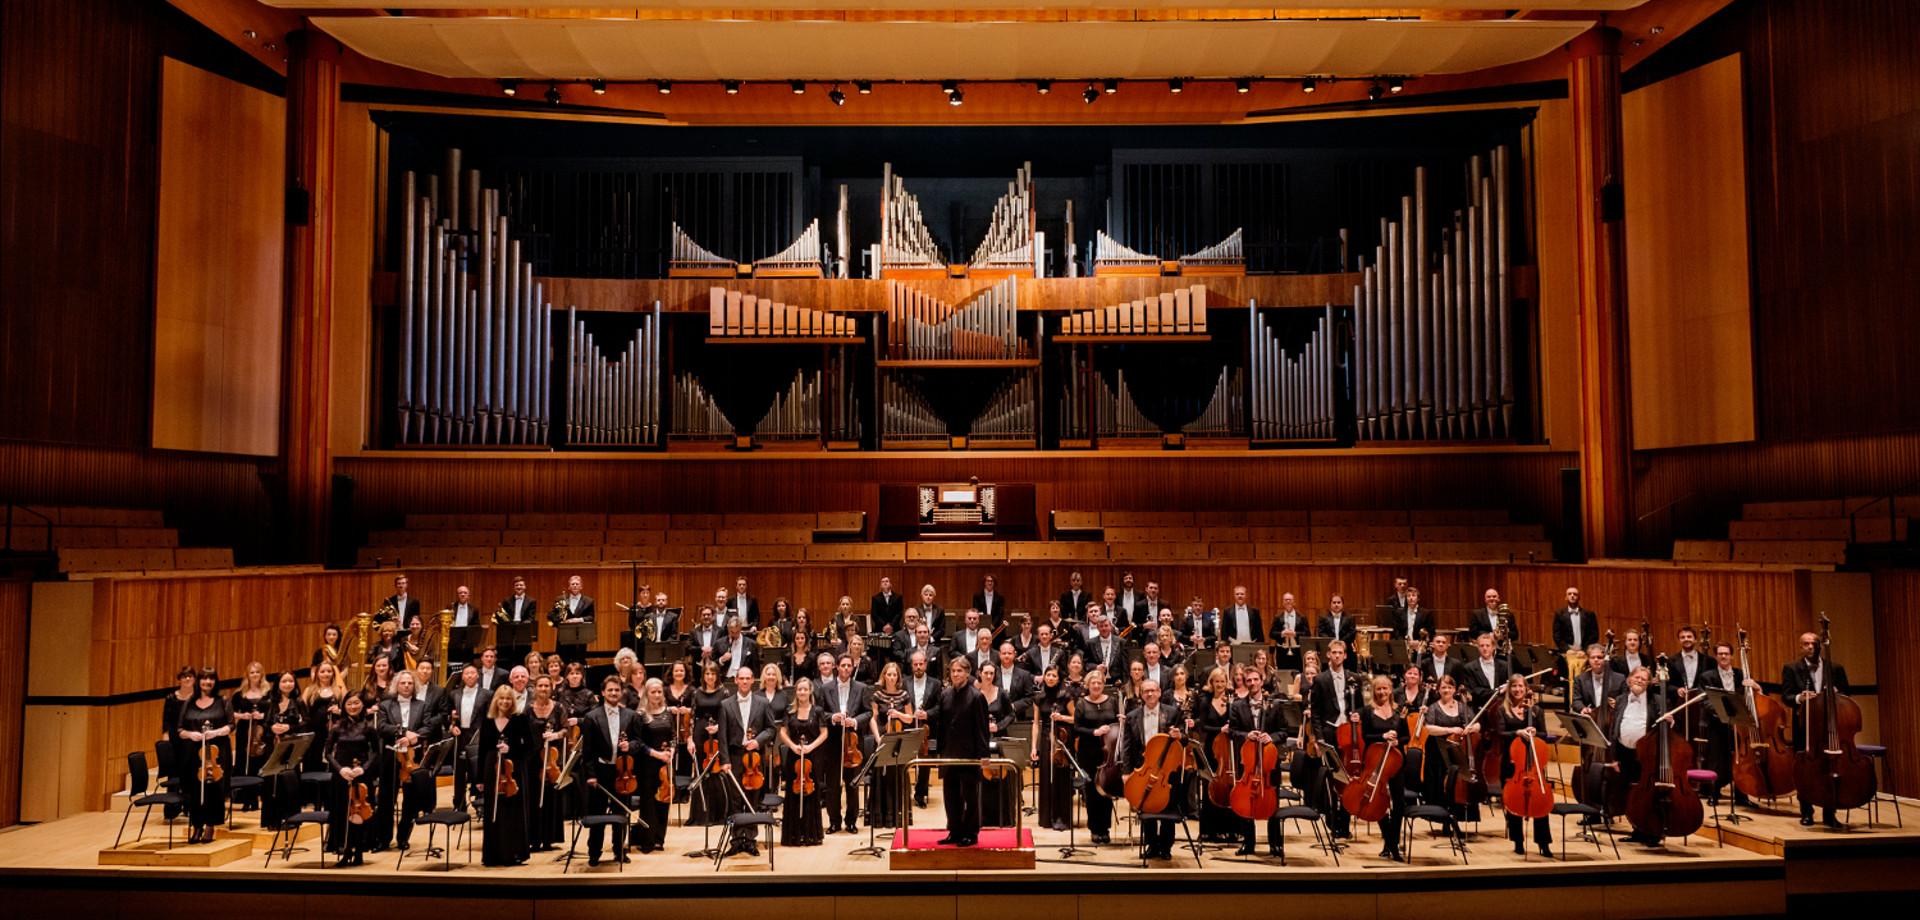 Philharmonia Orchestra - Esa-Pekka Salonen